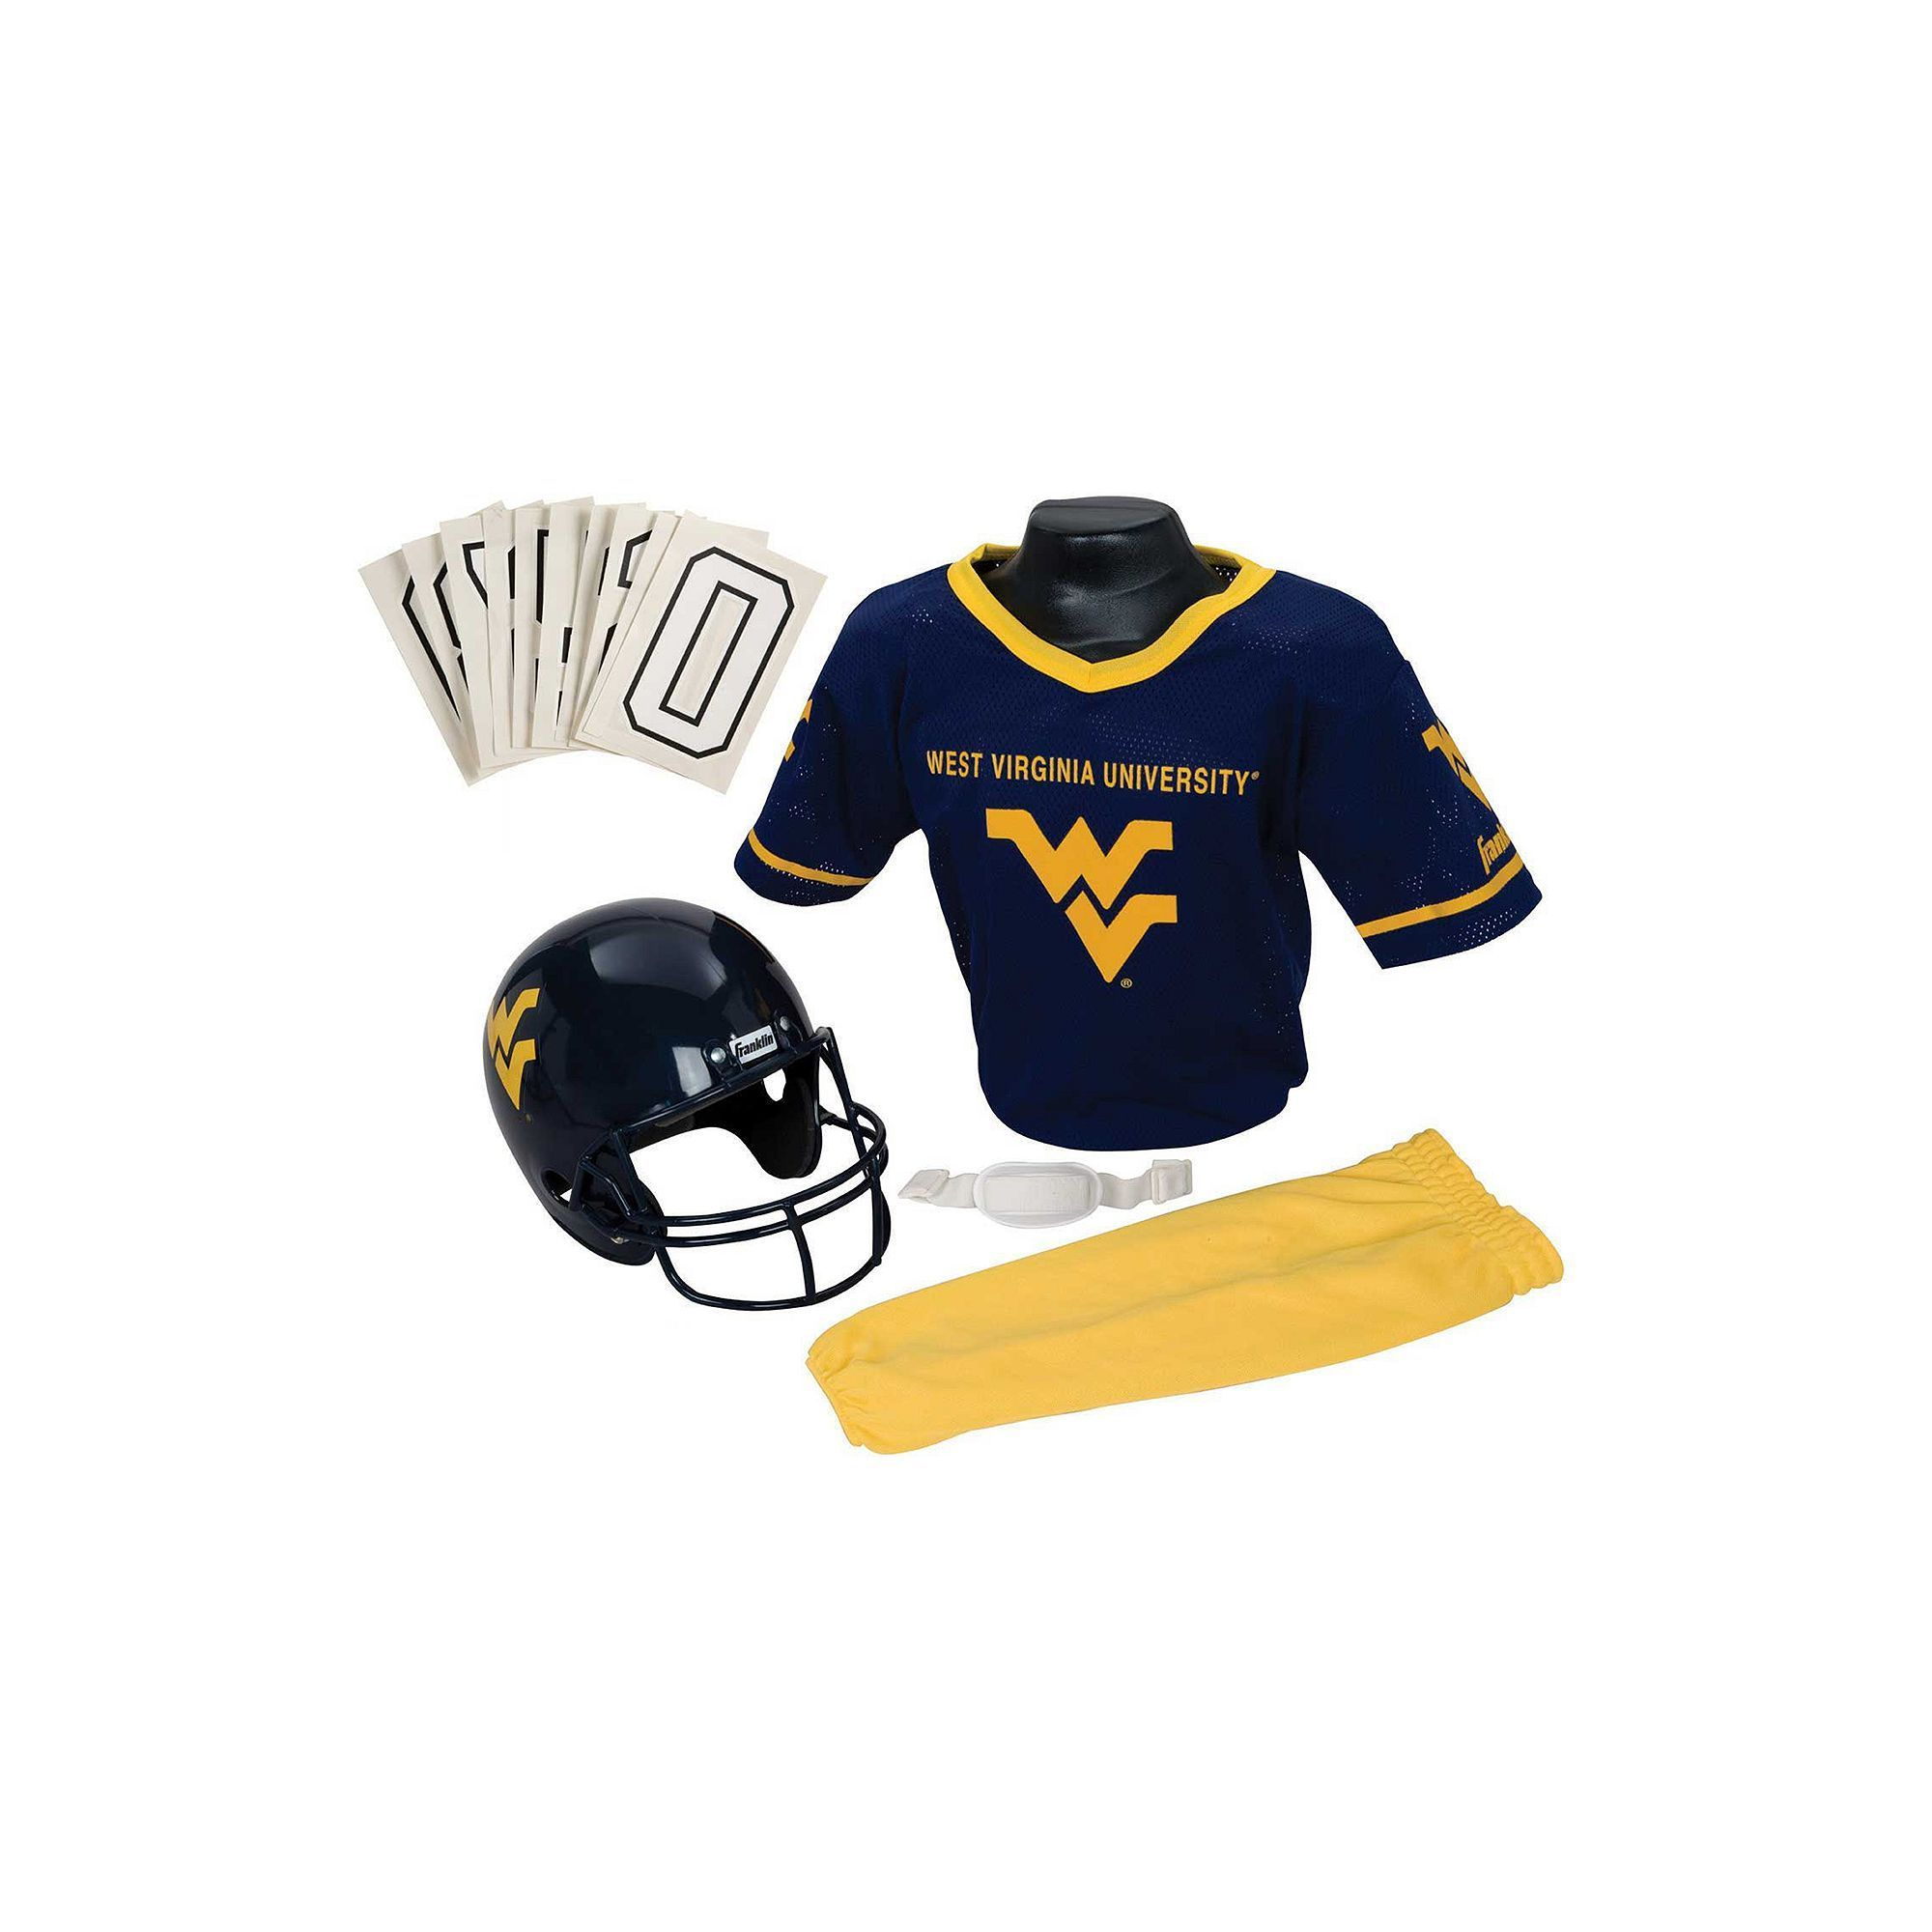 f1e5cc0ed69 Franklin Ncaa West Virginia University Mountaineers Deluxe Football Uniform  Set, Boy's, Size: S/M, Multicolor